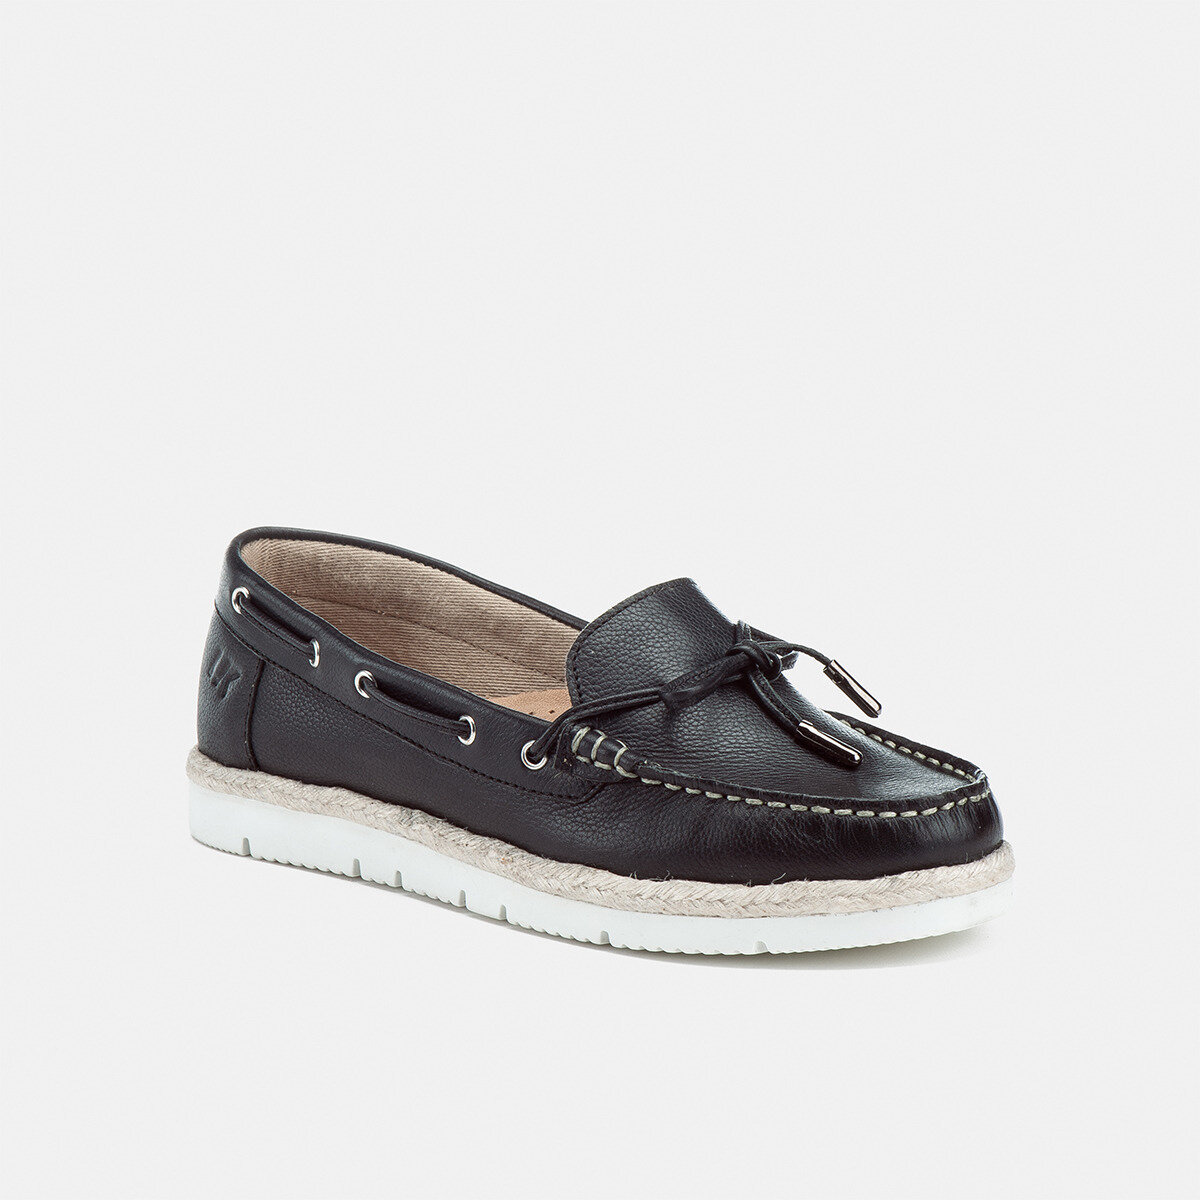 GILDA BLACK Woman Loafers